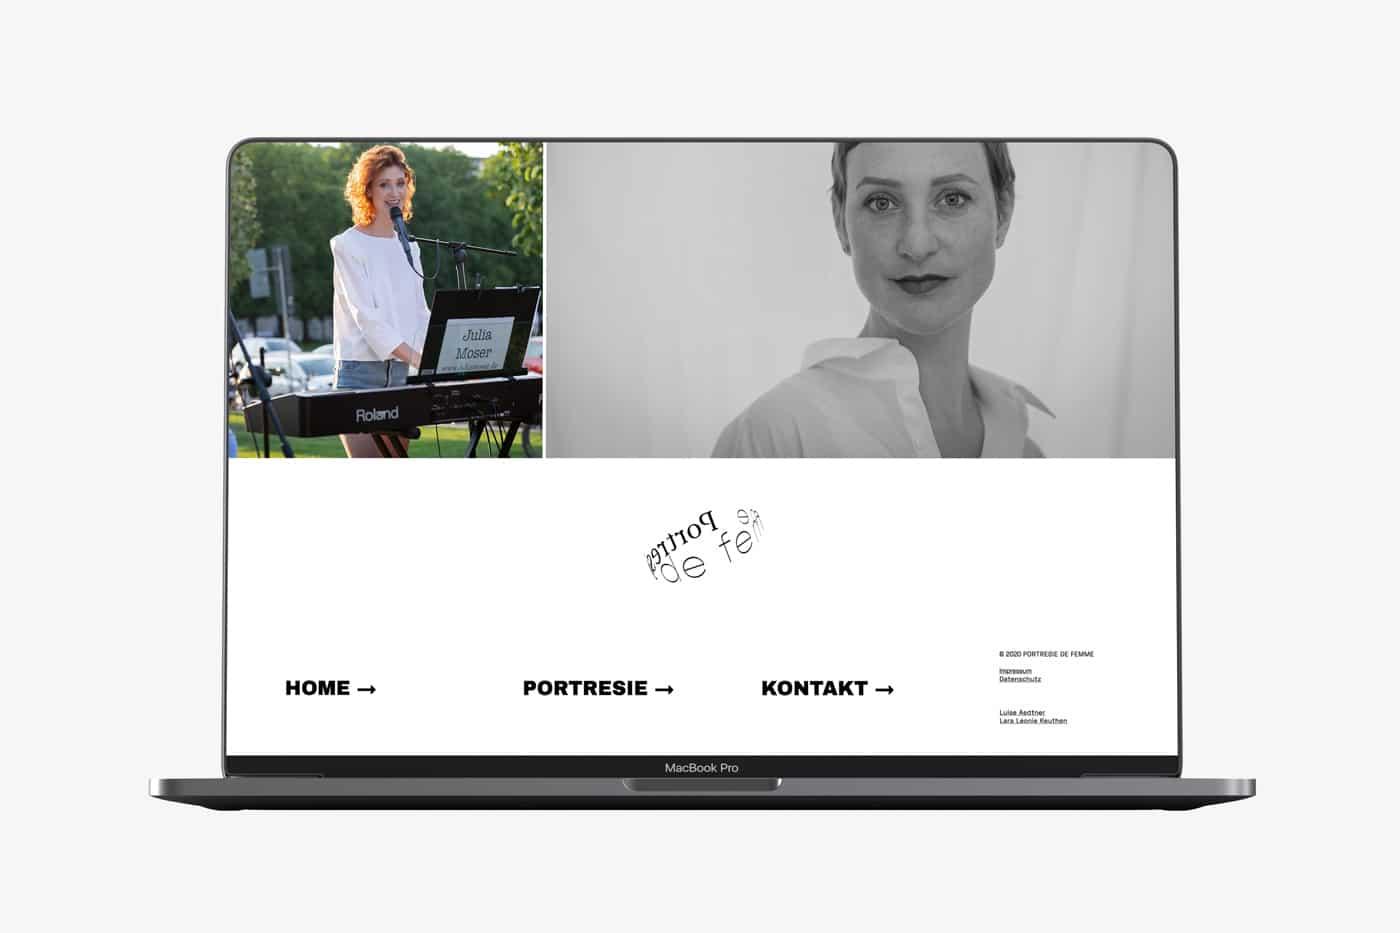 Screendesign Julia Moser, Portresie de femme